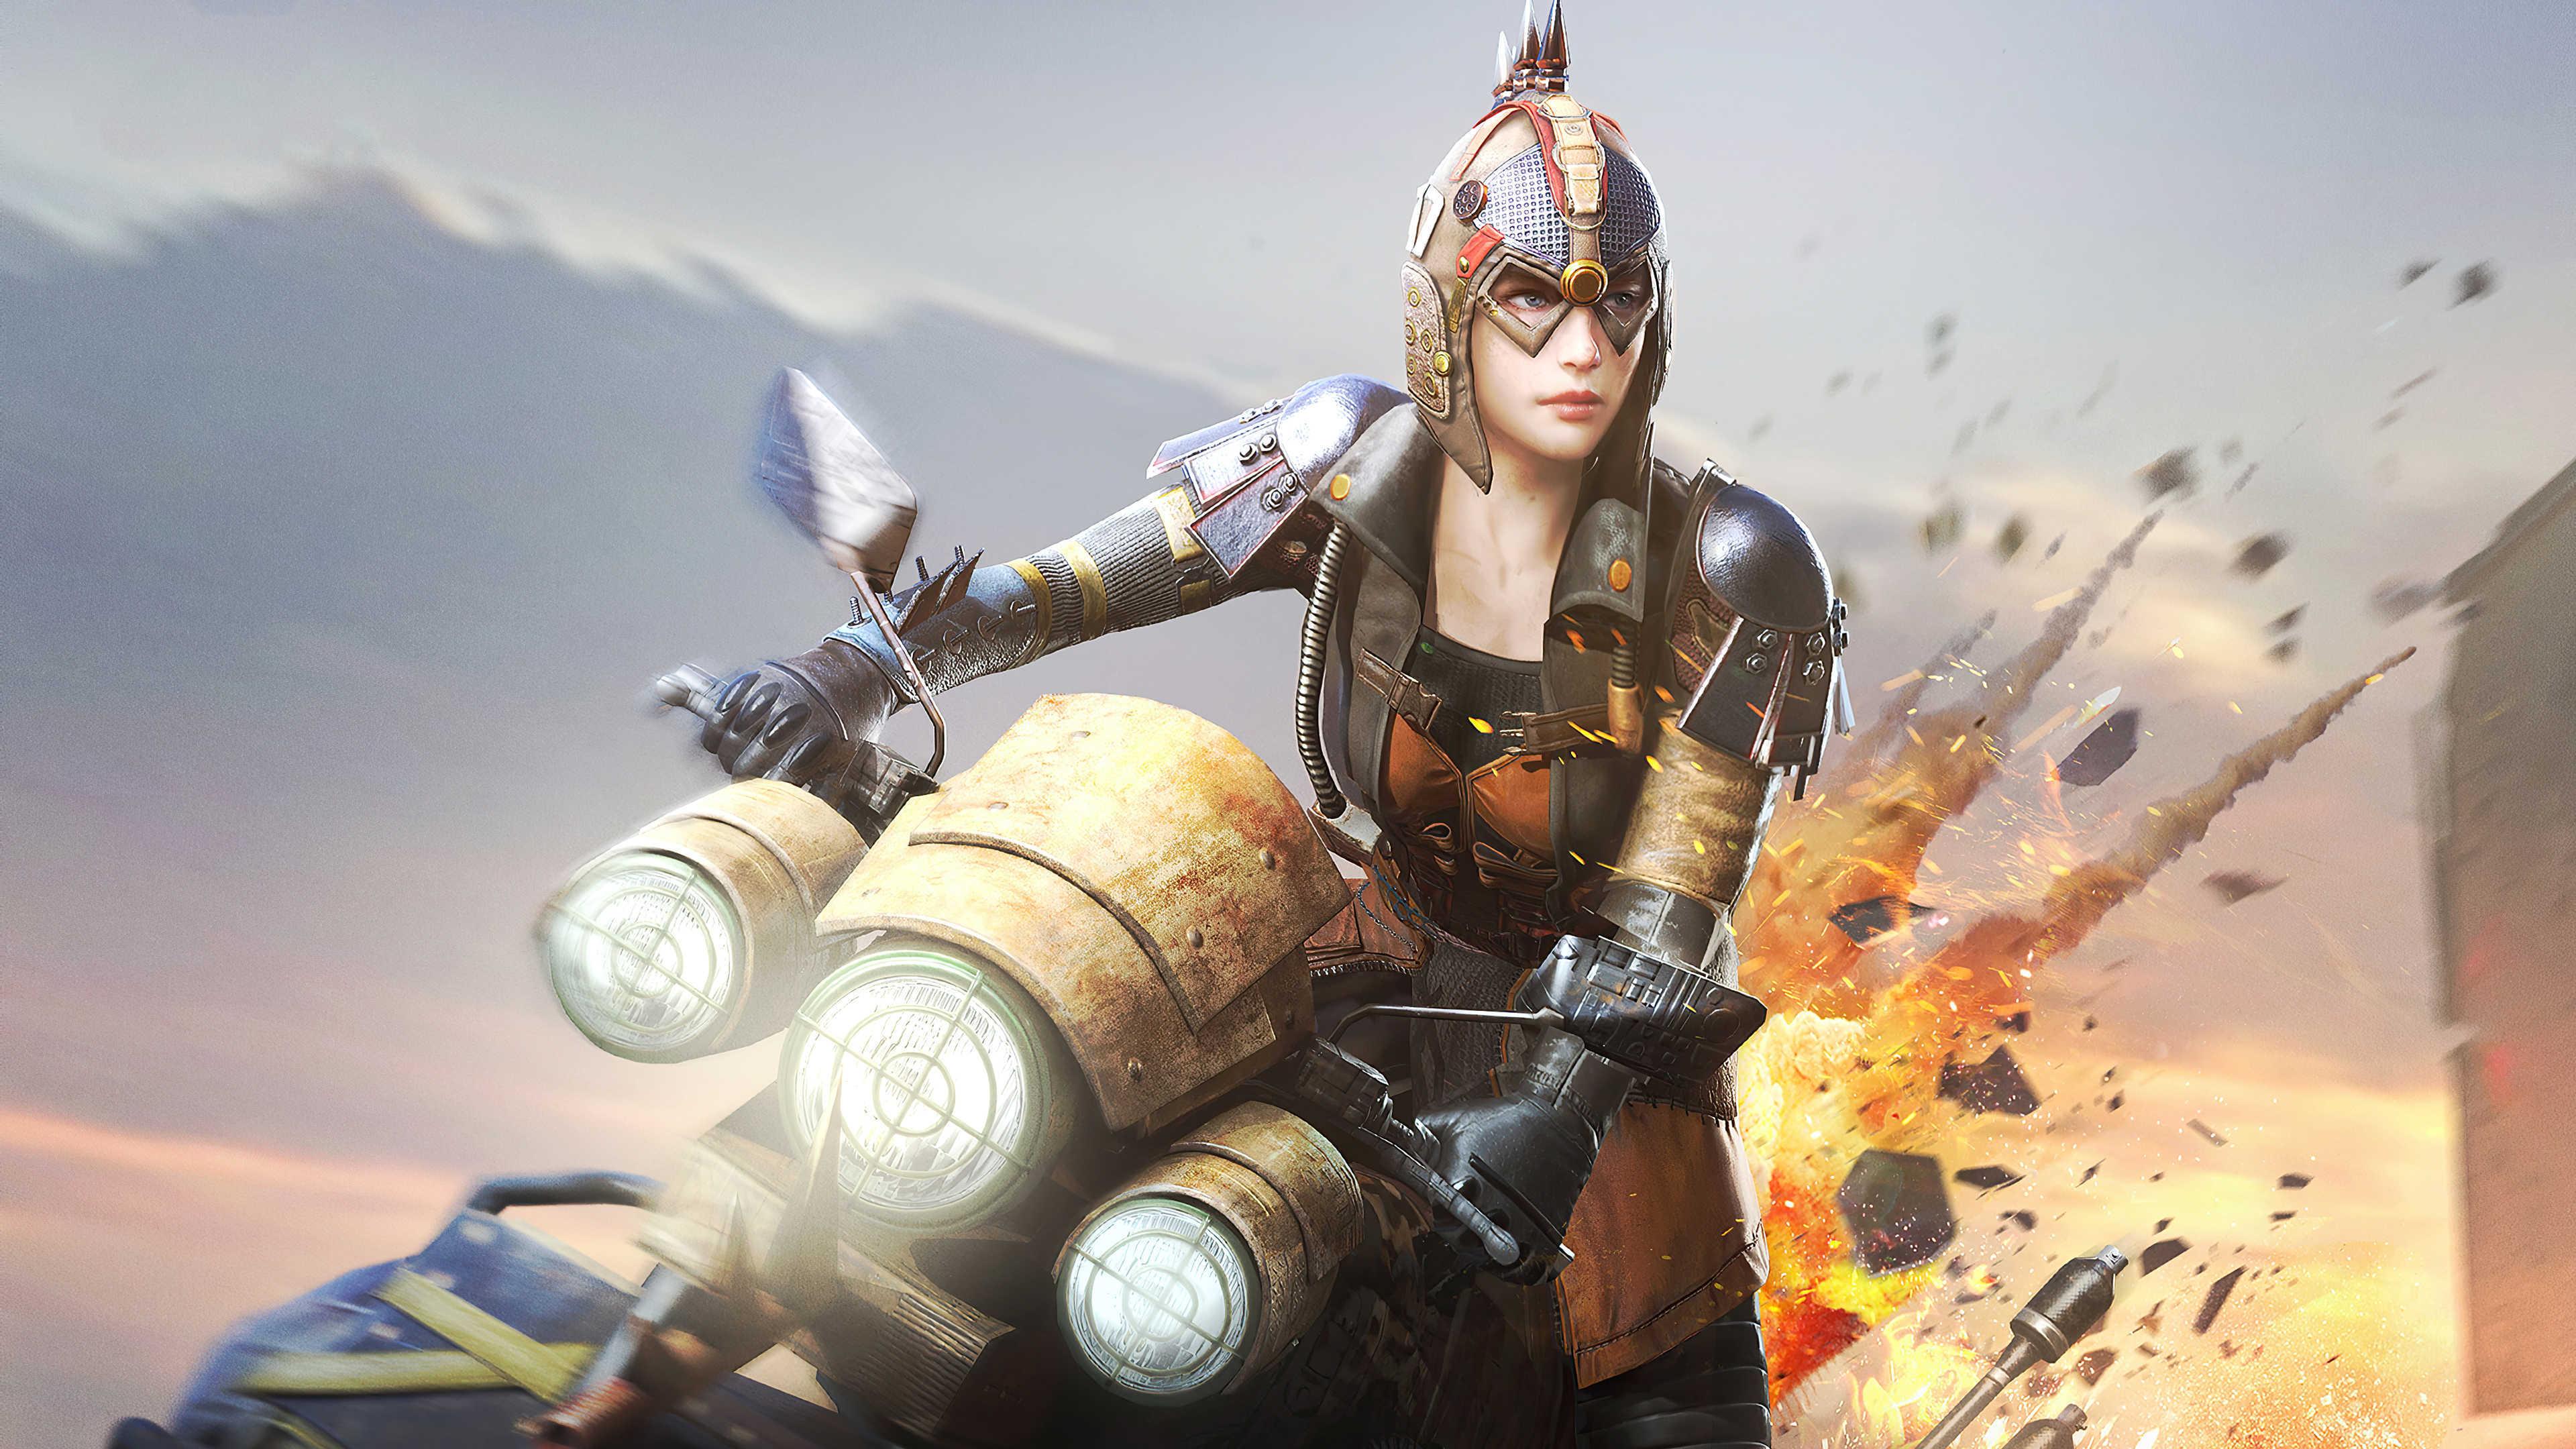 Playerunknown's Bike Battlegrounds [Video Game]